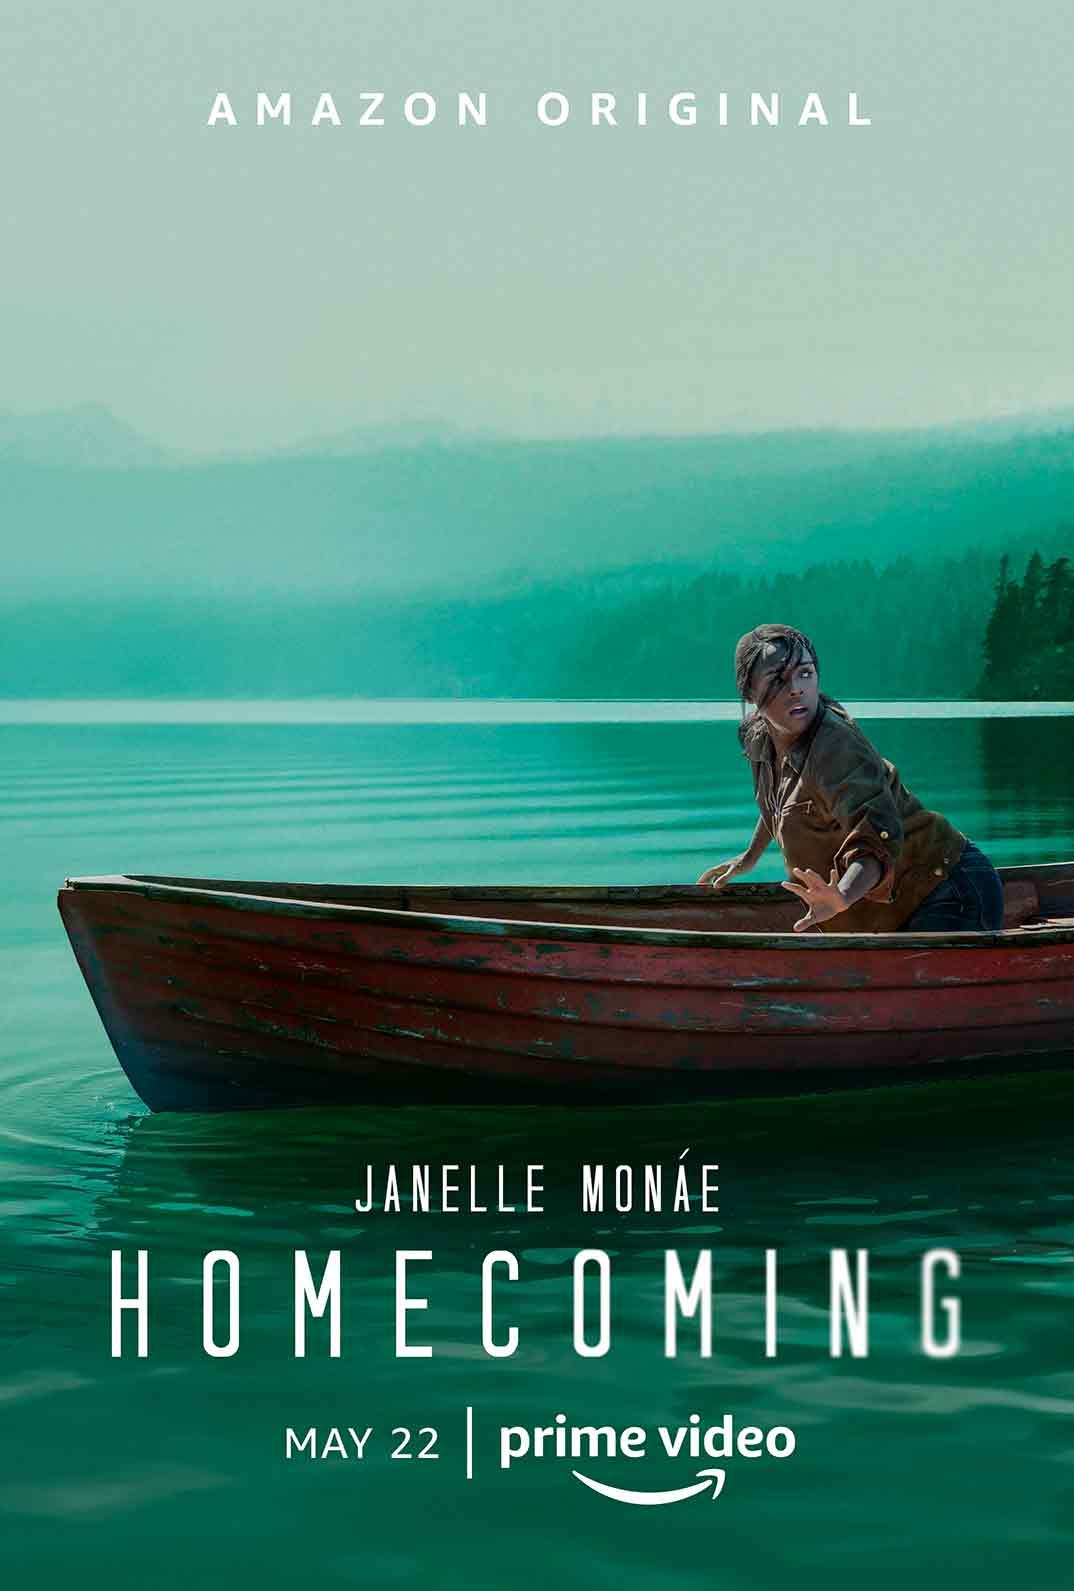 Homecoming © Amazon Prime Video